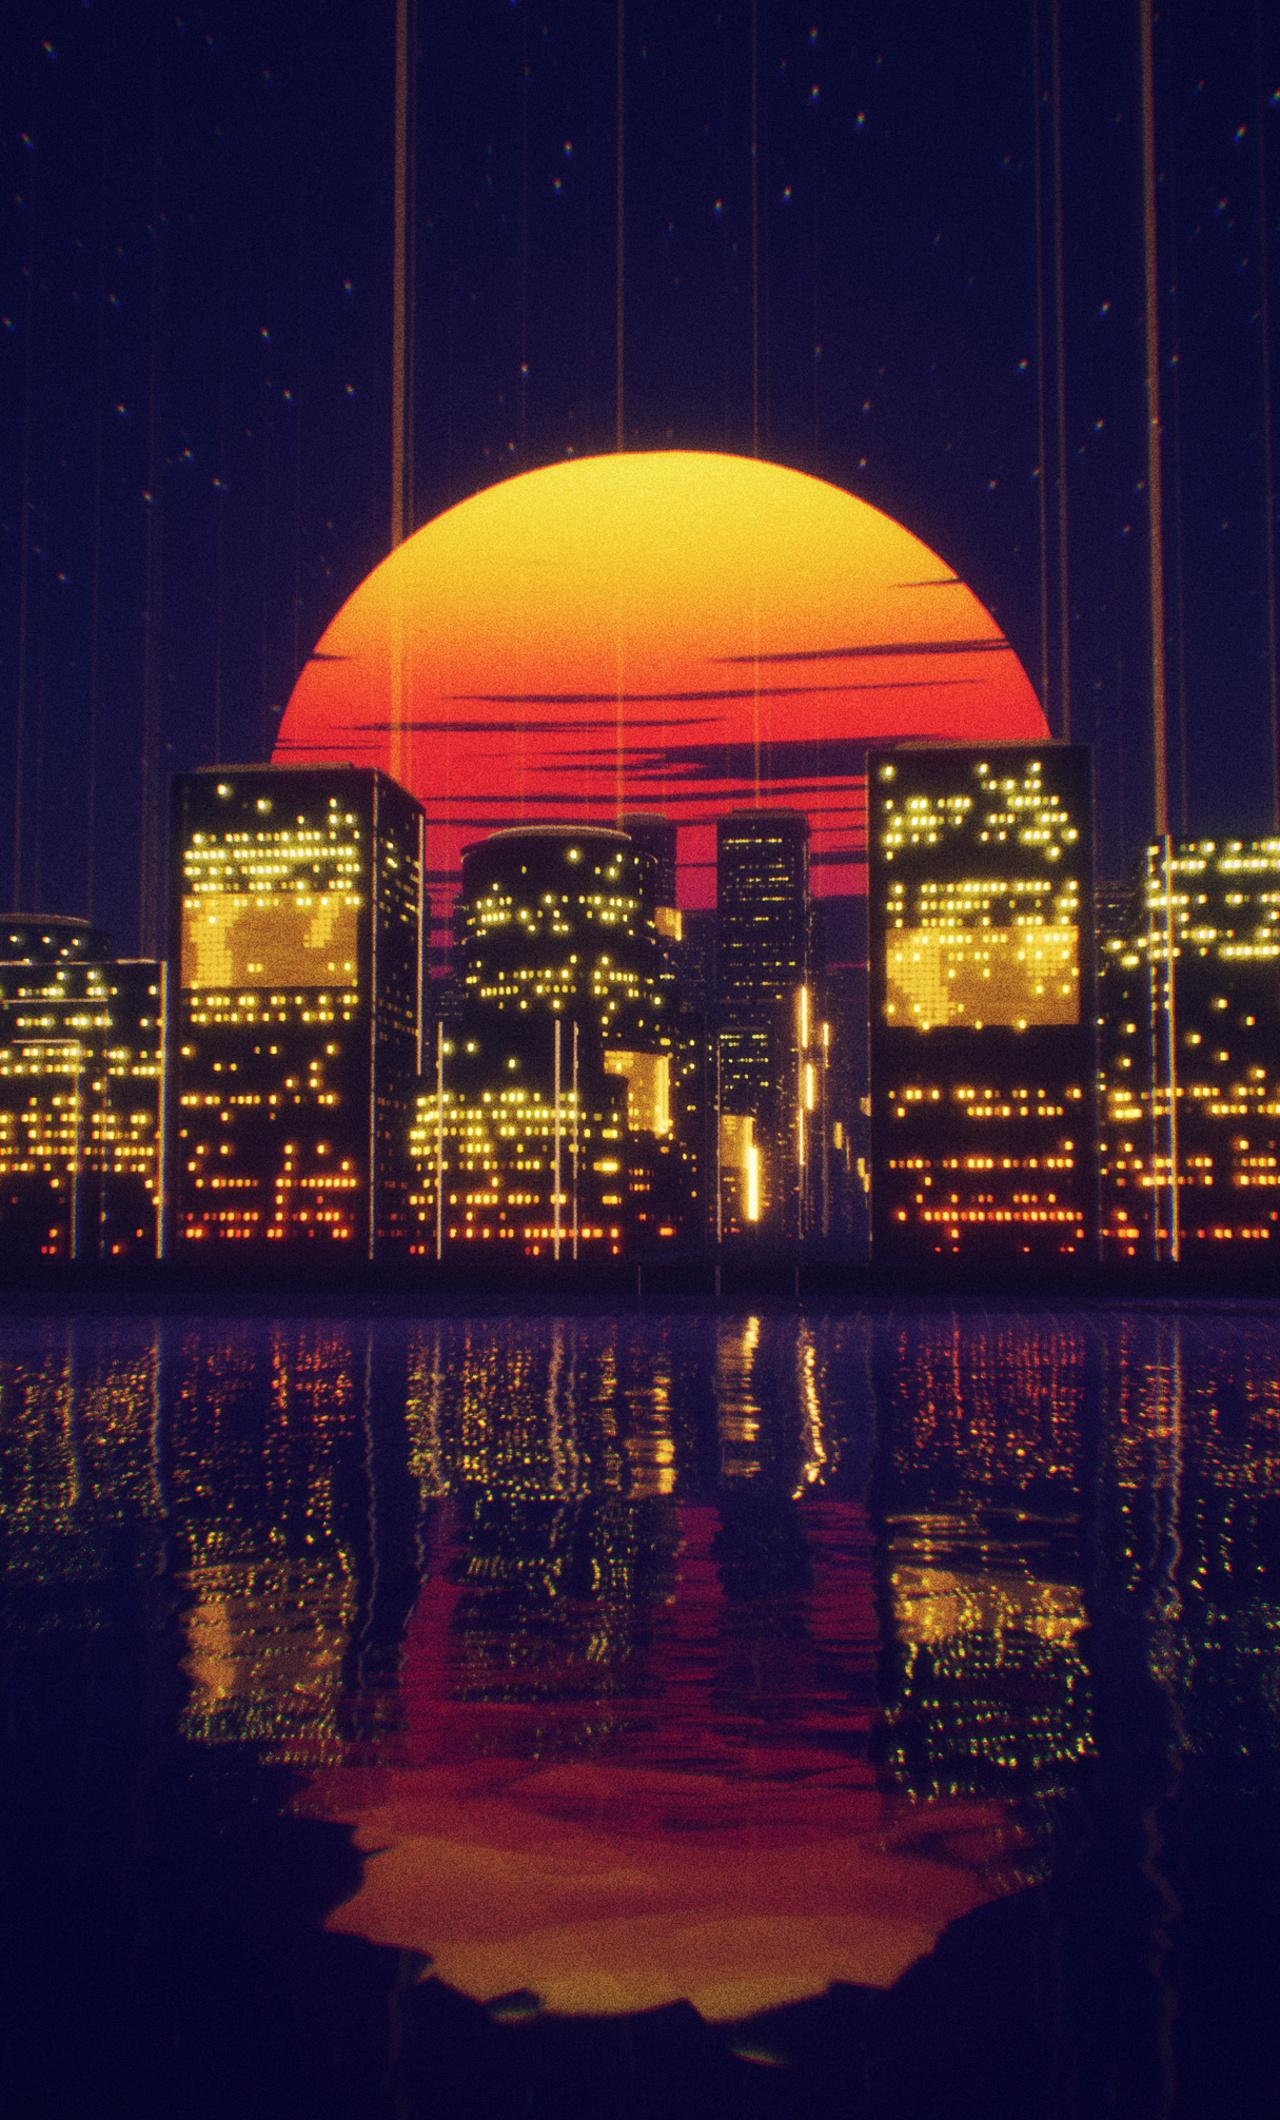 abstract city retro sunset night 4k xi